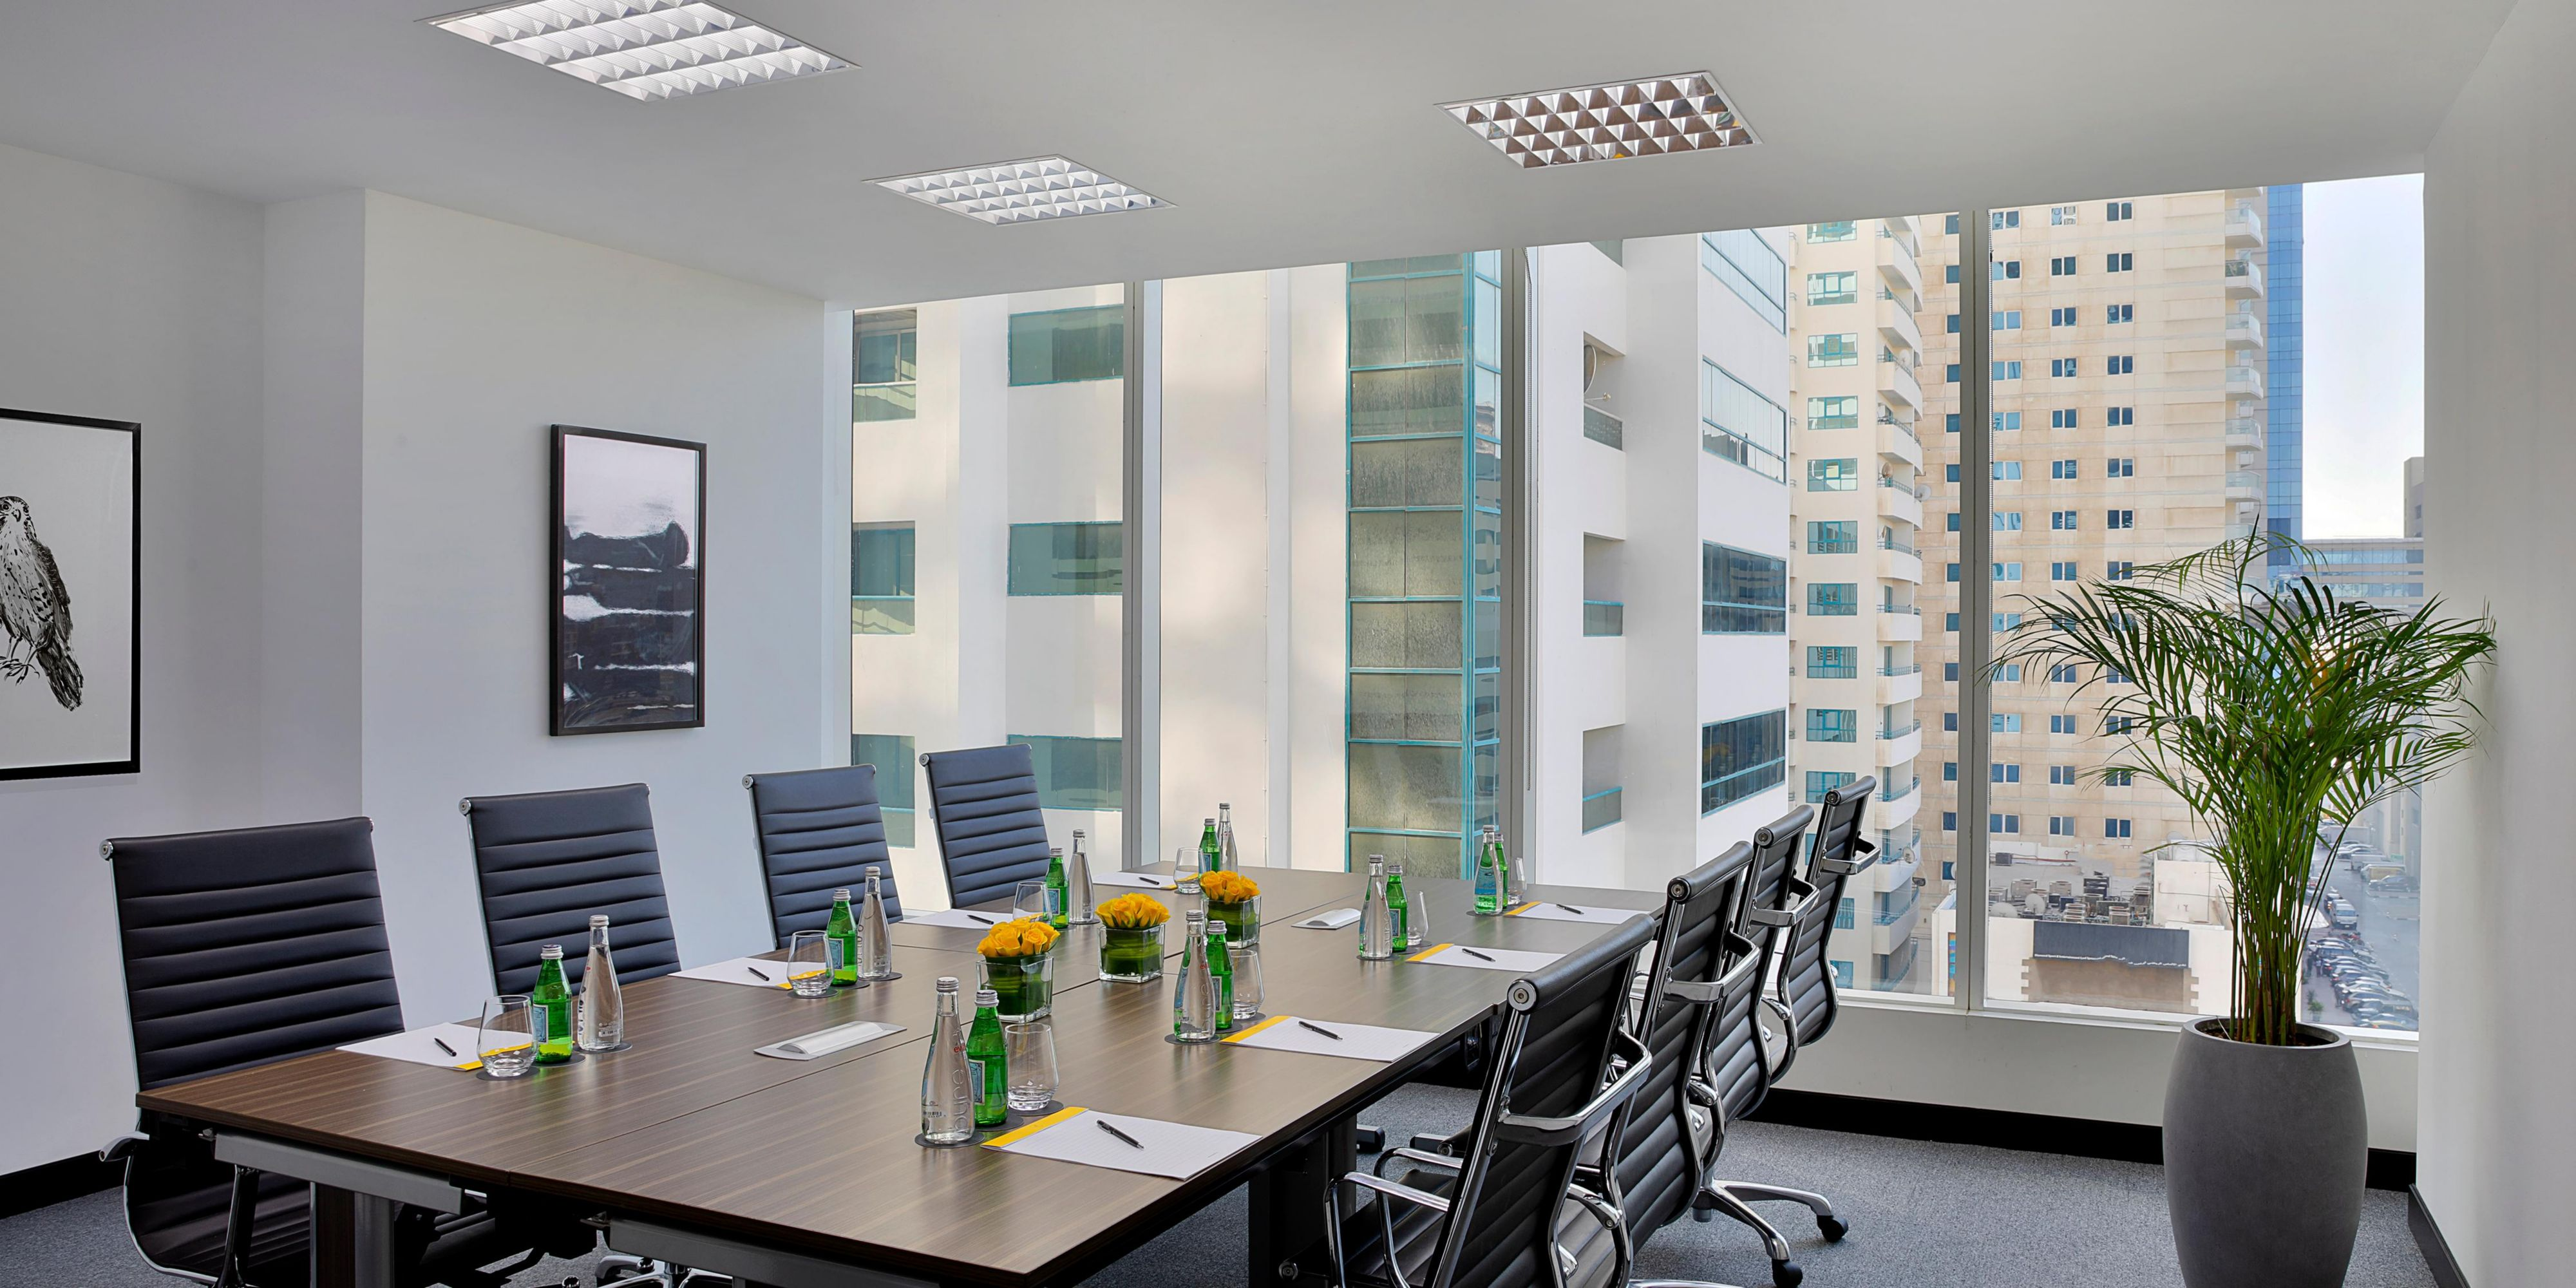 Falcon Meeting Rooms, voco Dubai, Sheikh Zayed Road